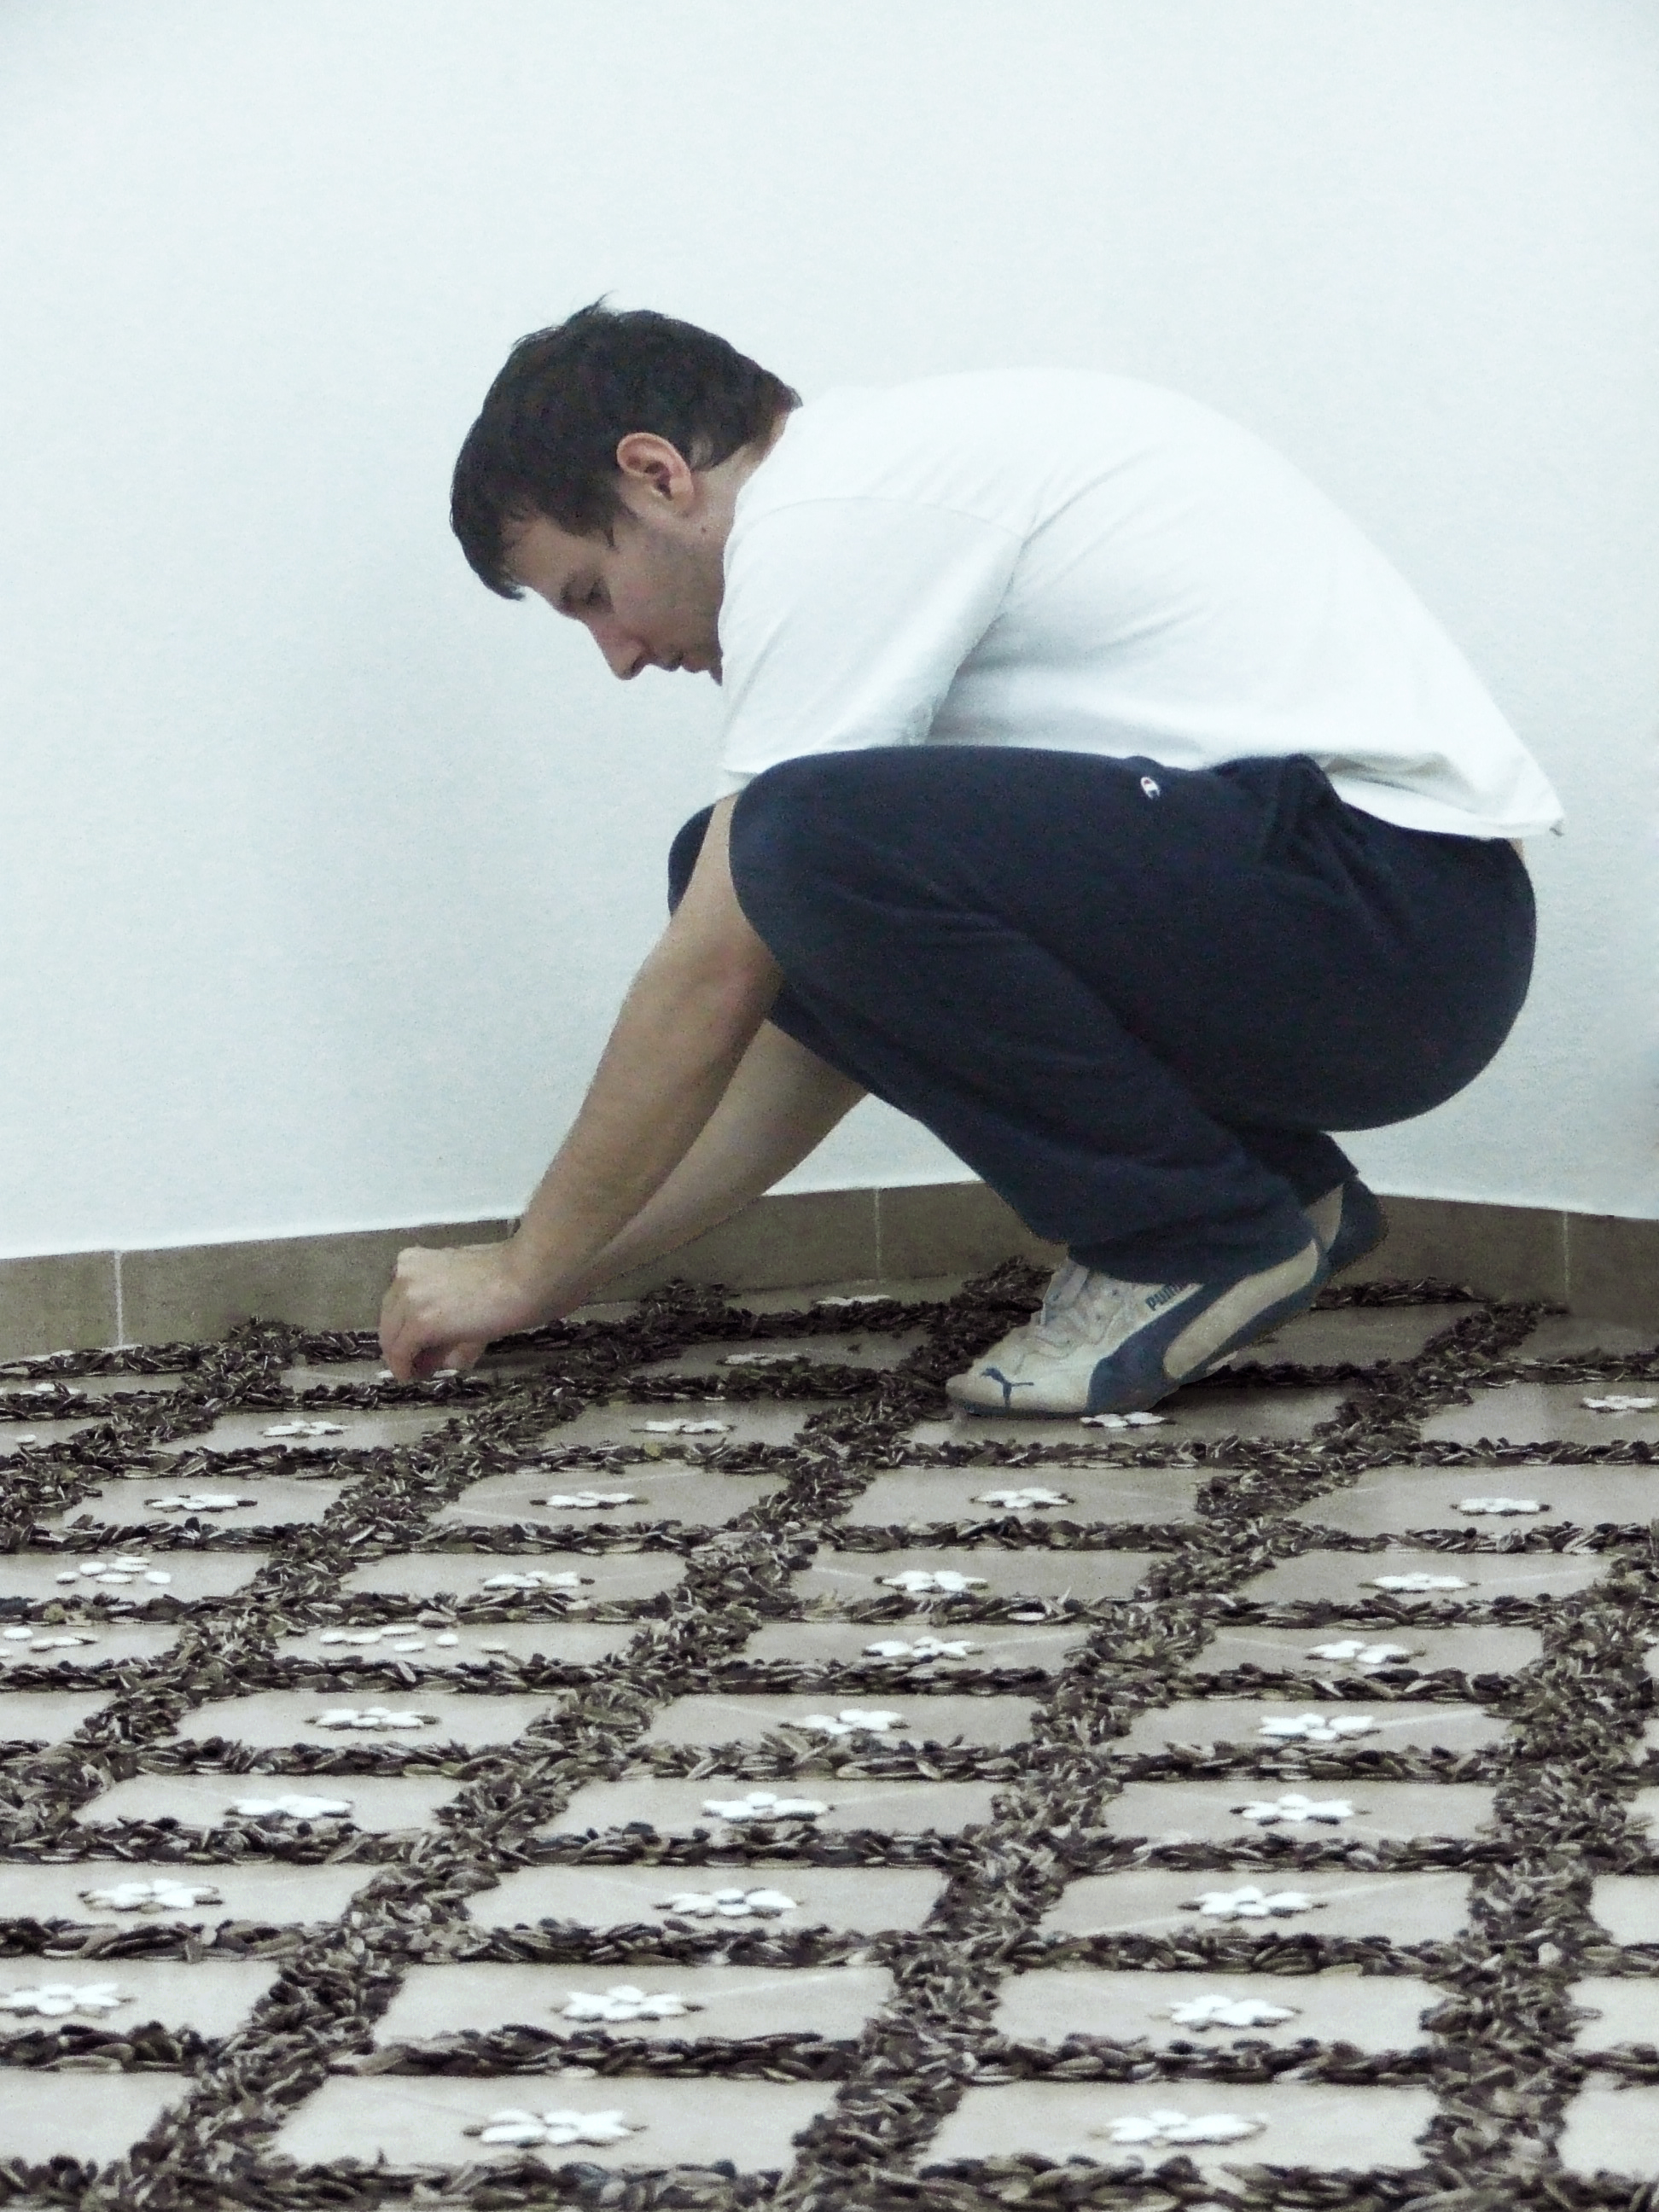 Seeds floor_8_Shahar Tuchner.jpg